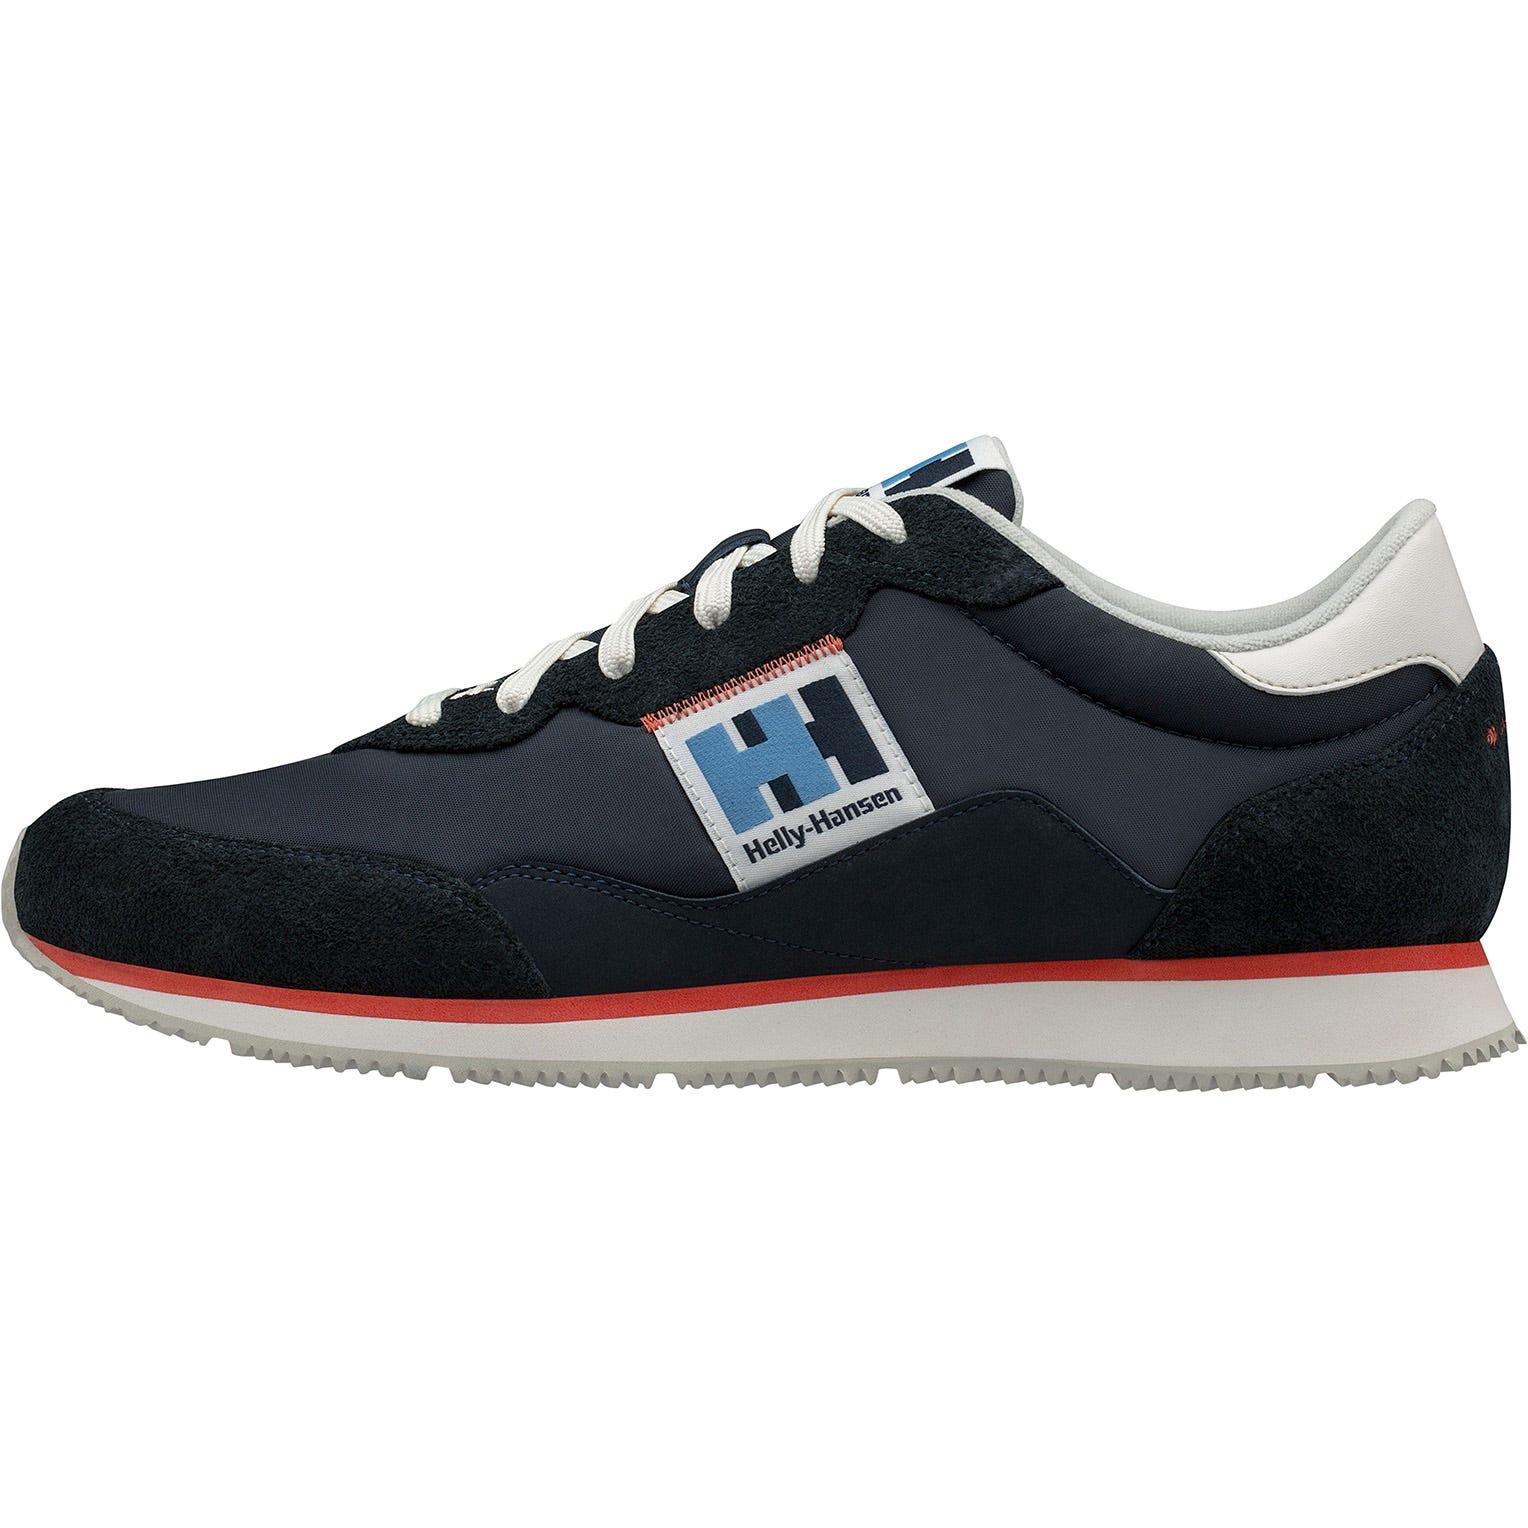 Helly Hansen Ripples Lowcut Sneaker Mens Navy 42.5/9